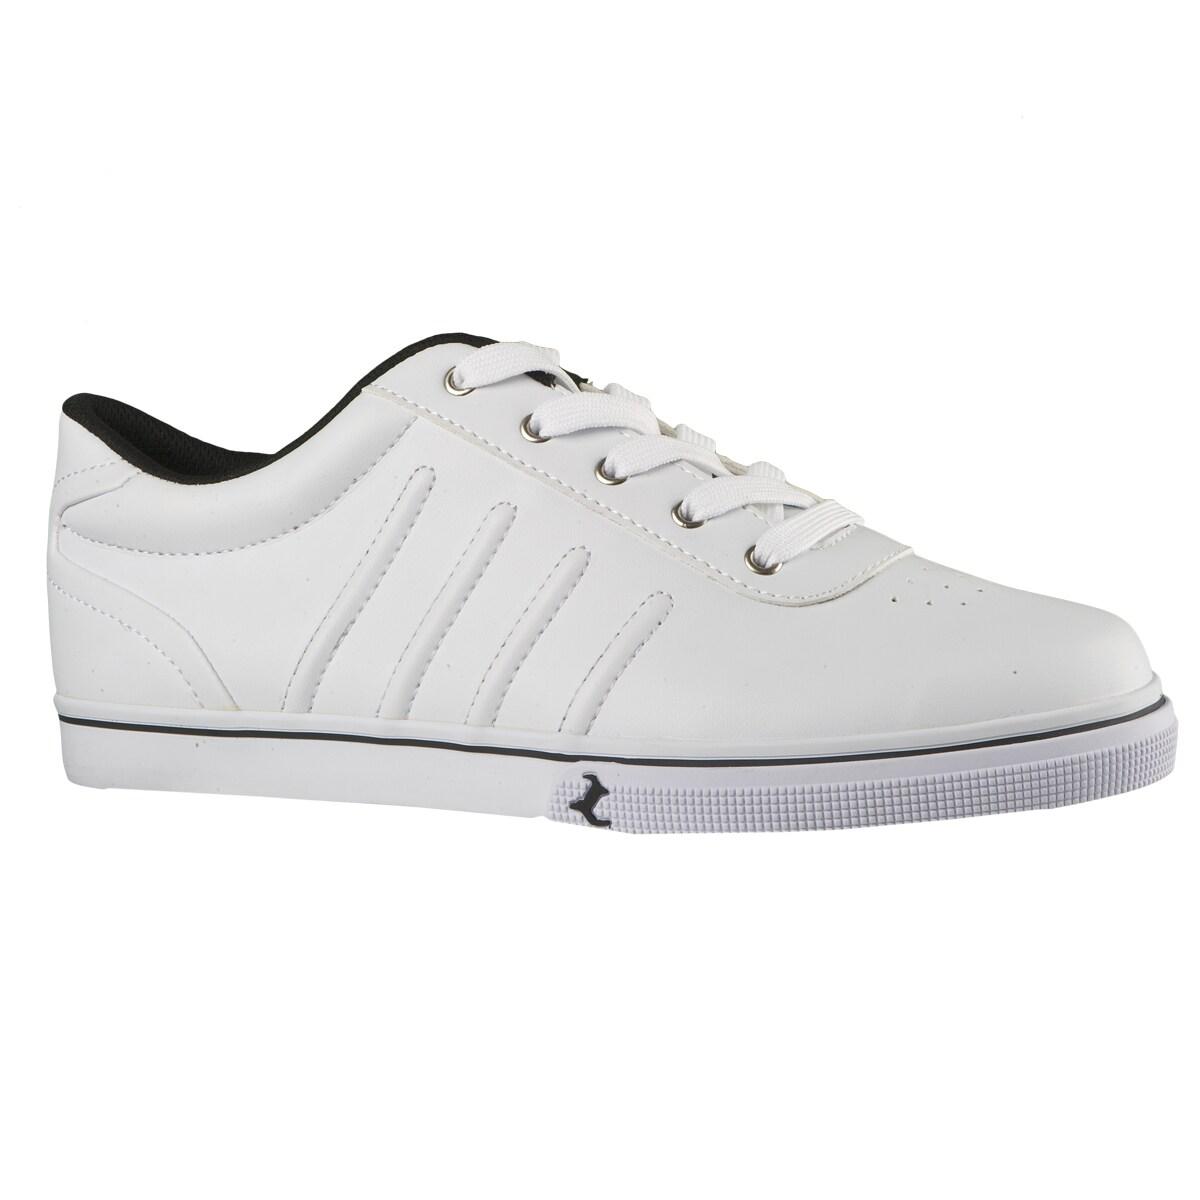 Lugz Men's 'Revolt' White Sneakers